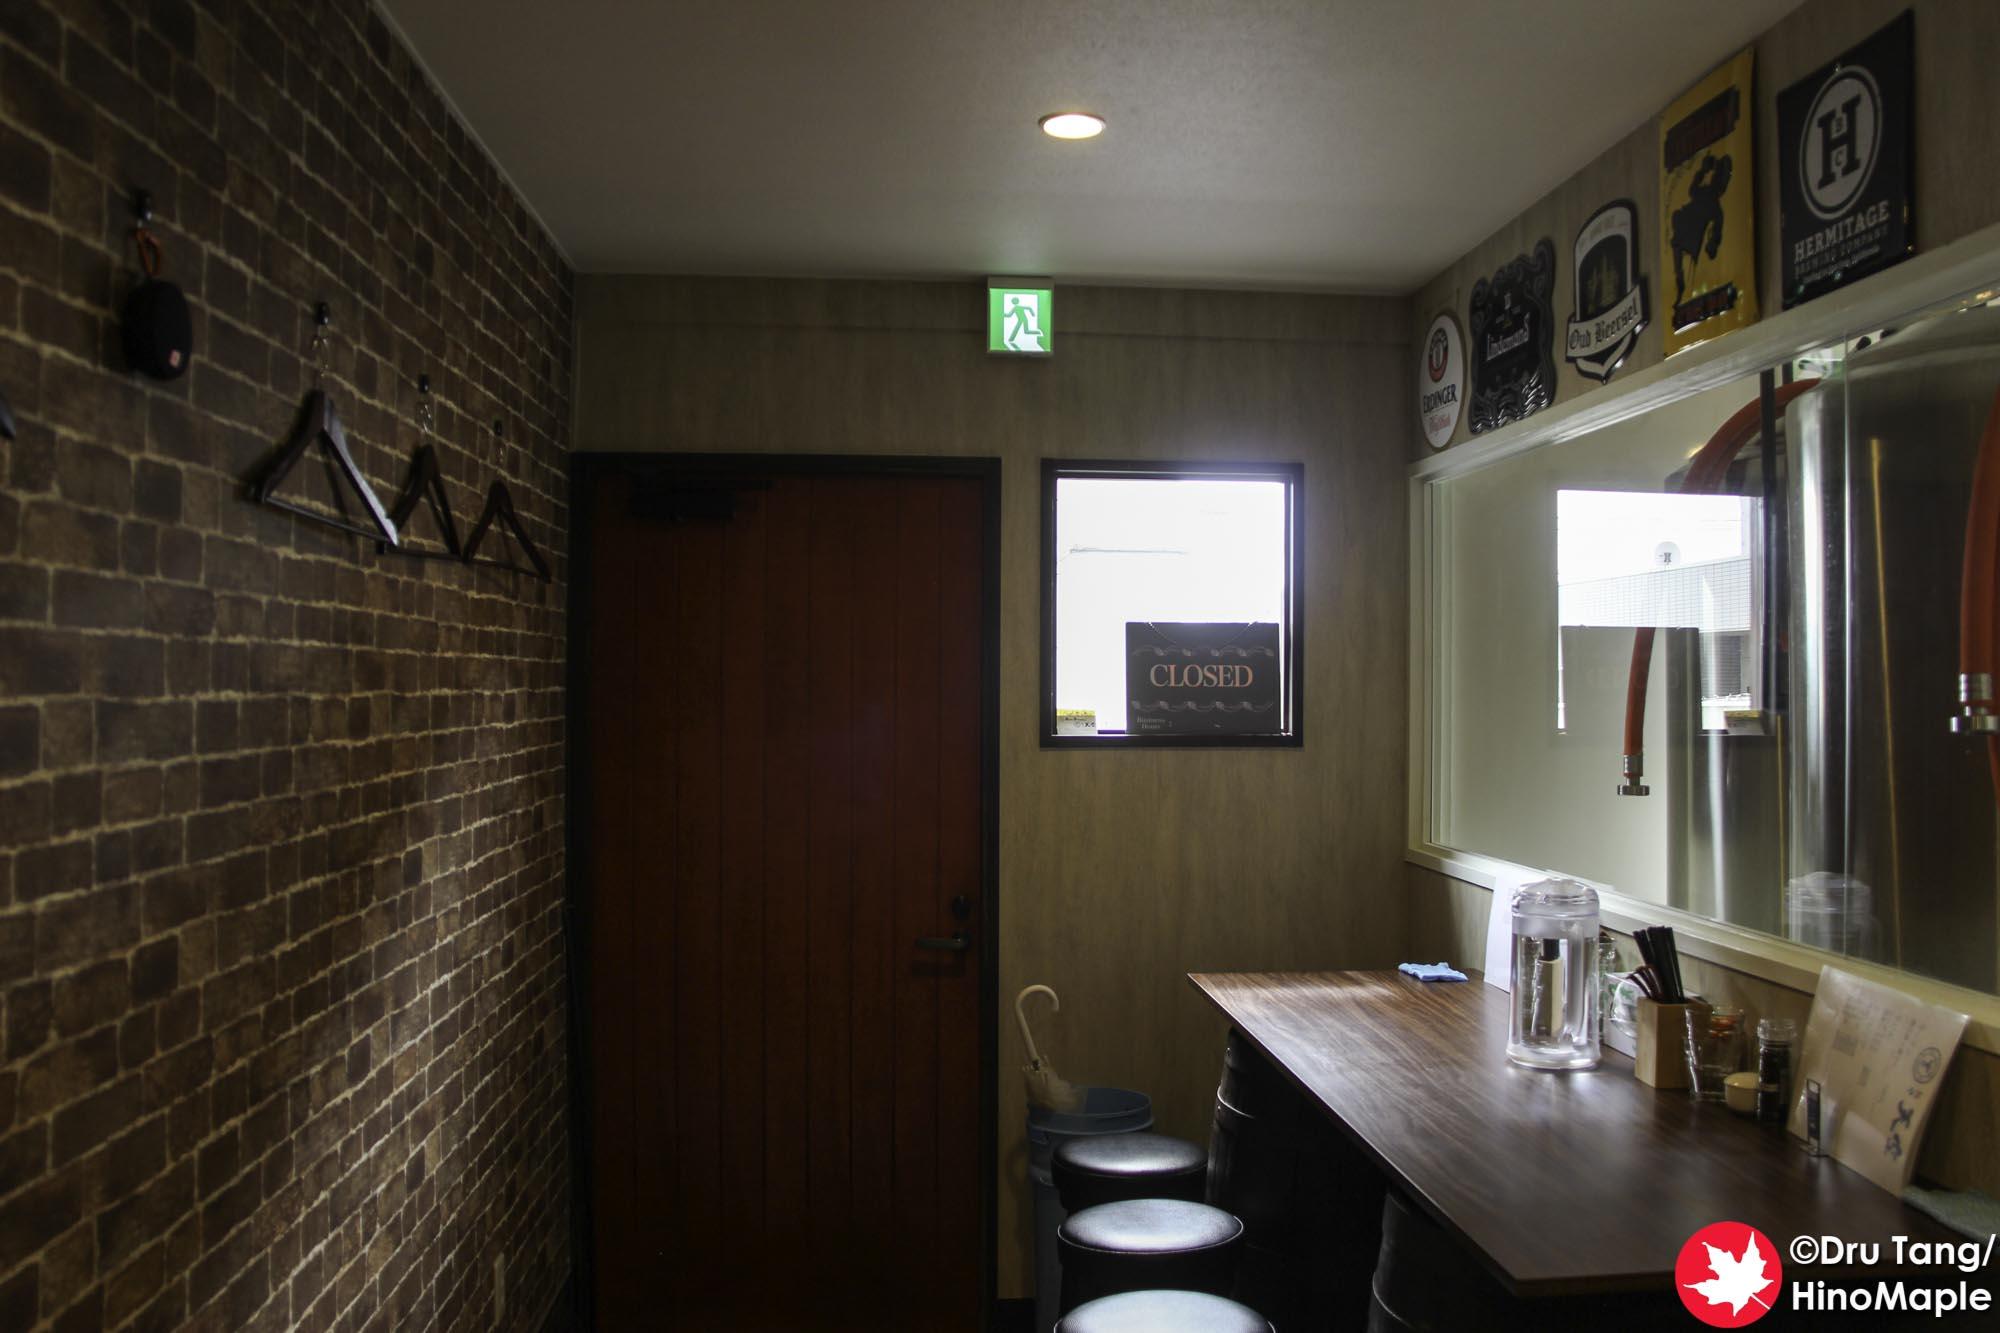 Roto Brewery